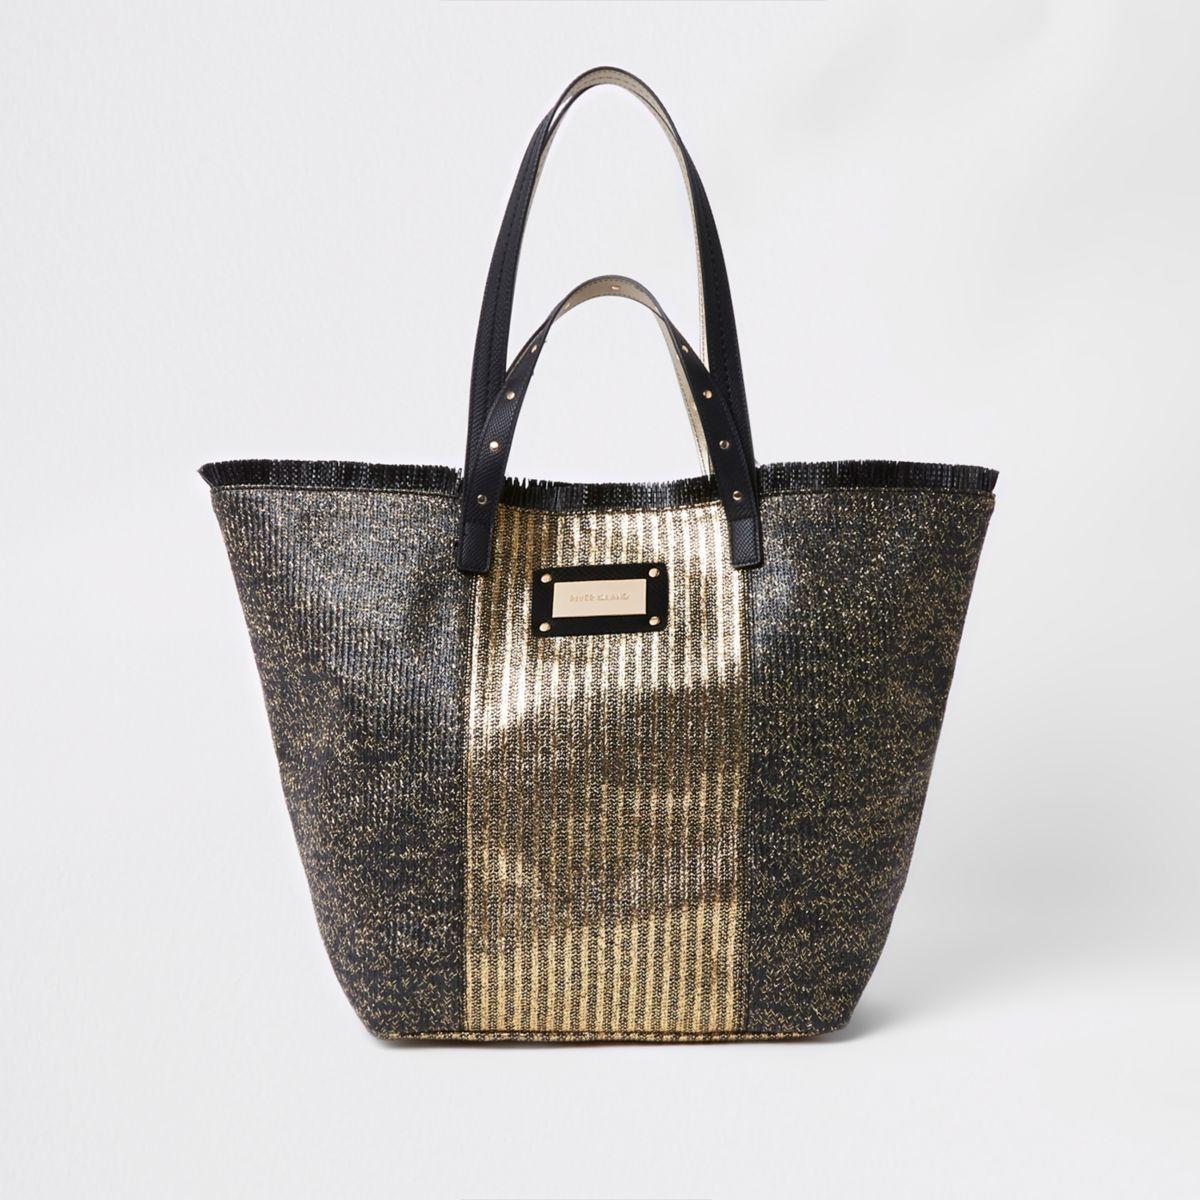 Black metallic woven beach bag